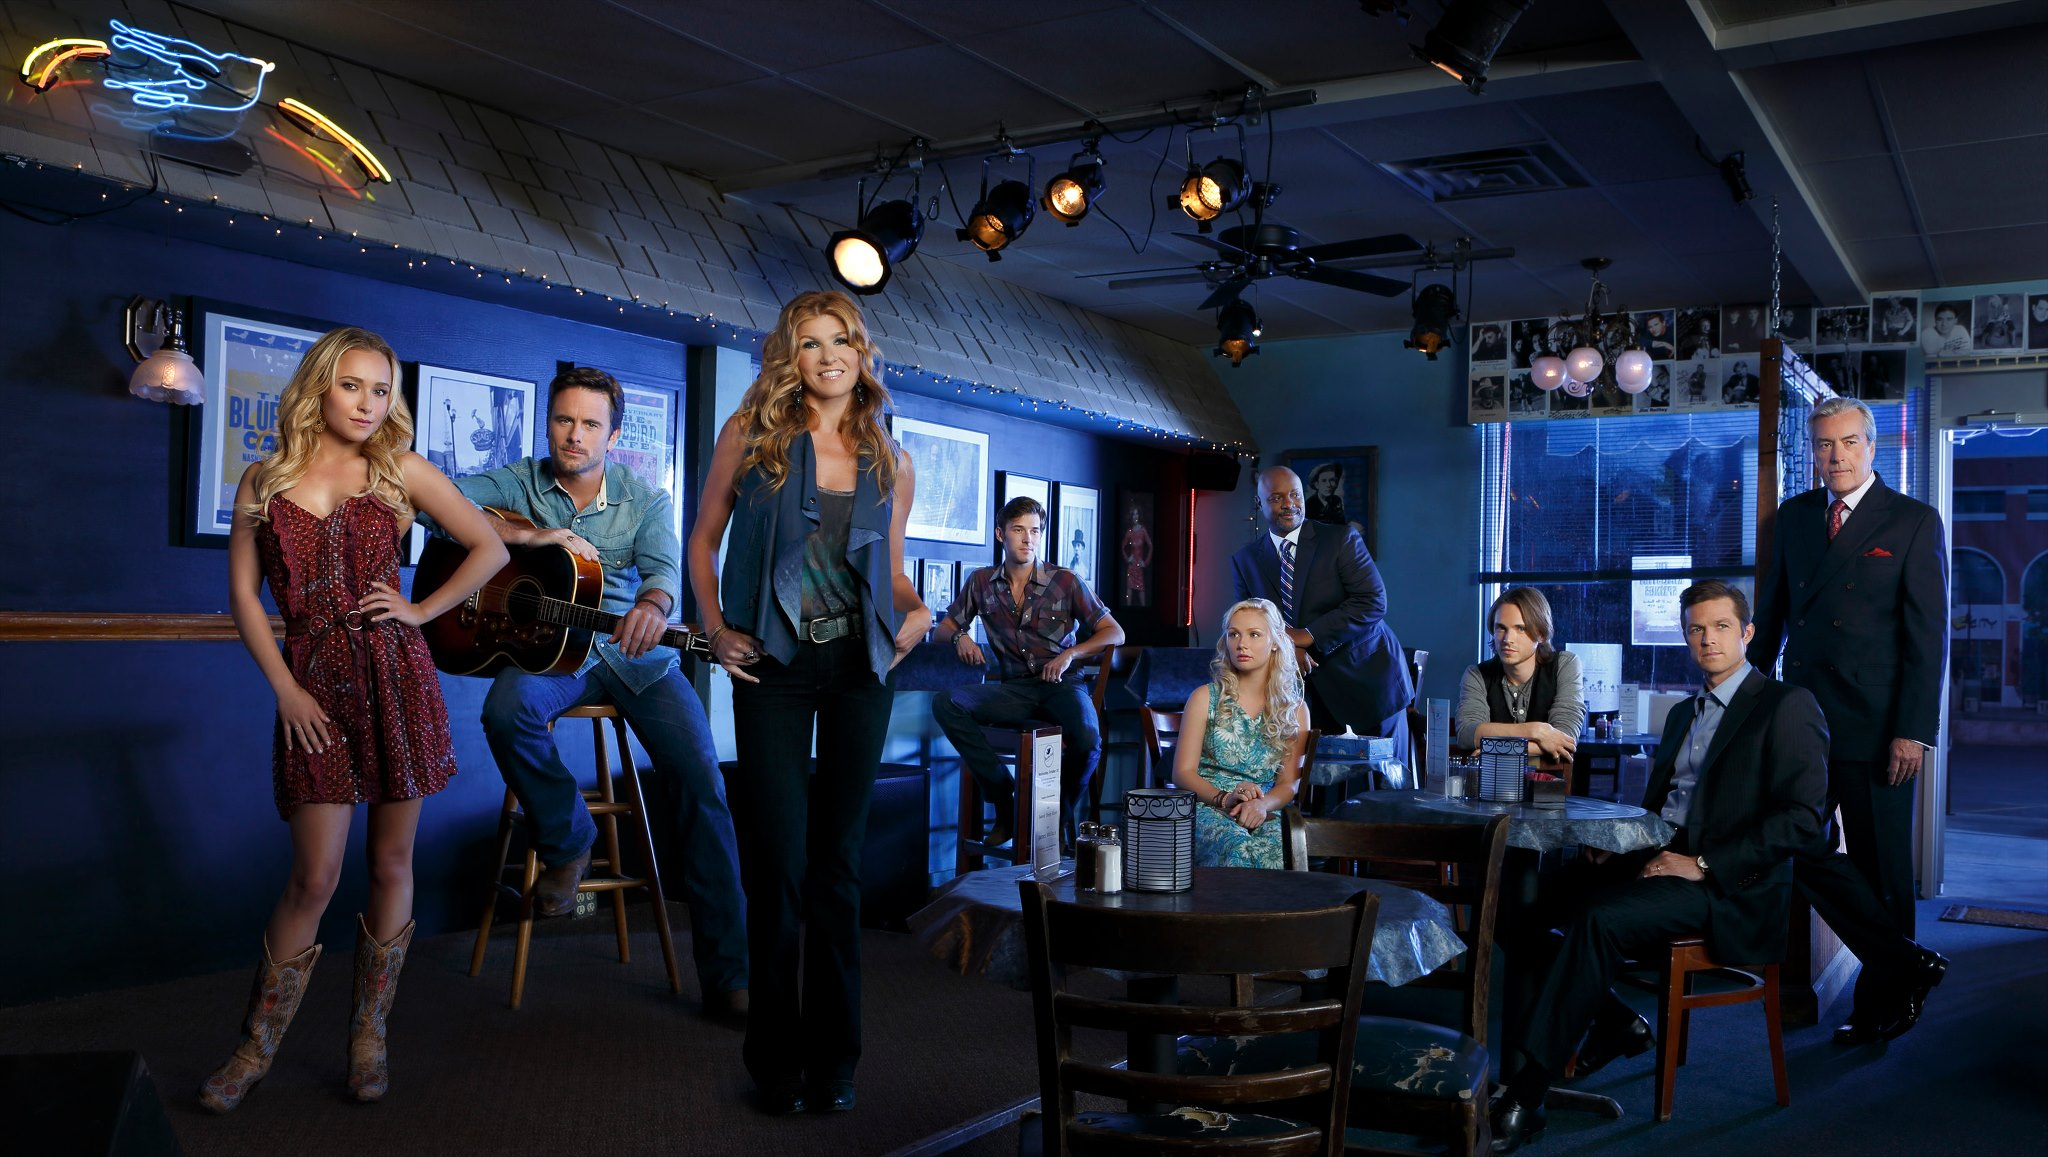 Nashville Drama Series Photo Courtesy ABC CountryMusicRocks.net